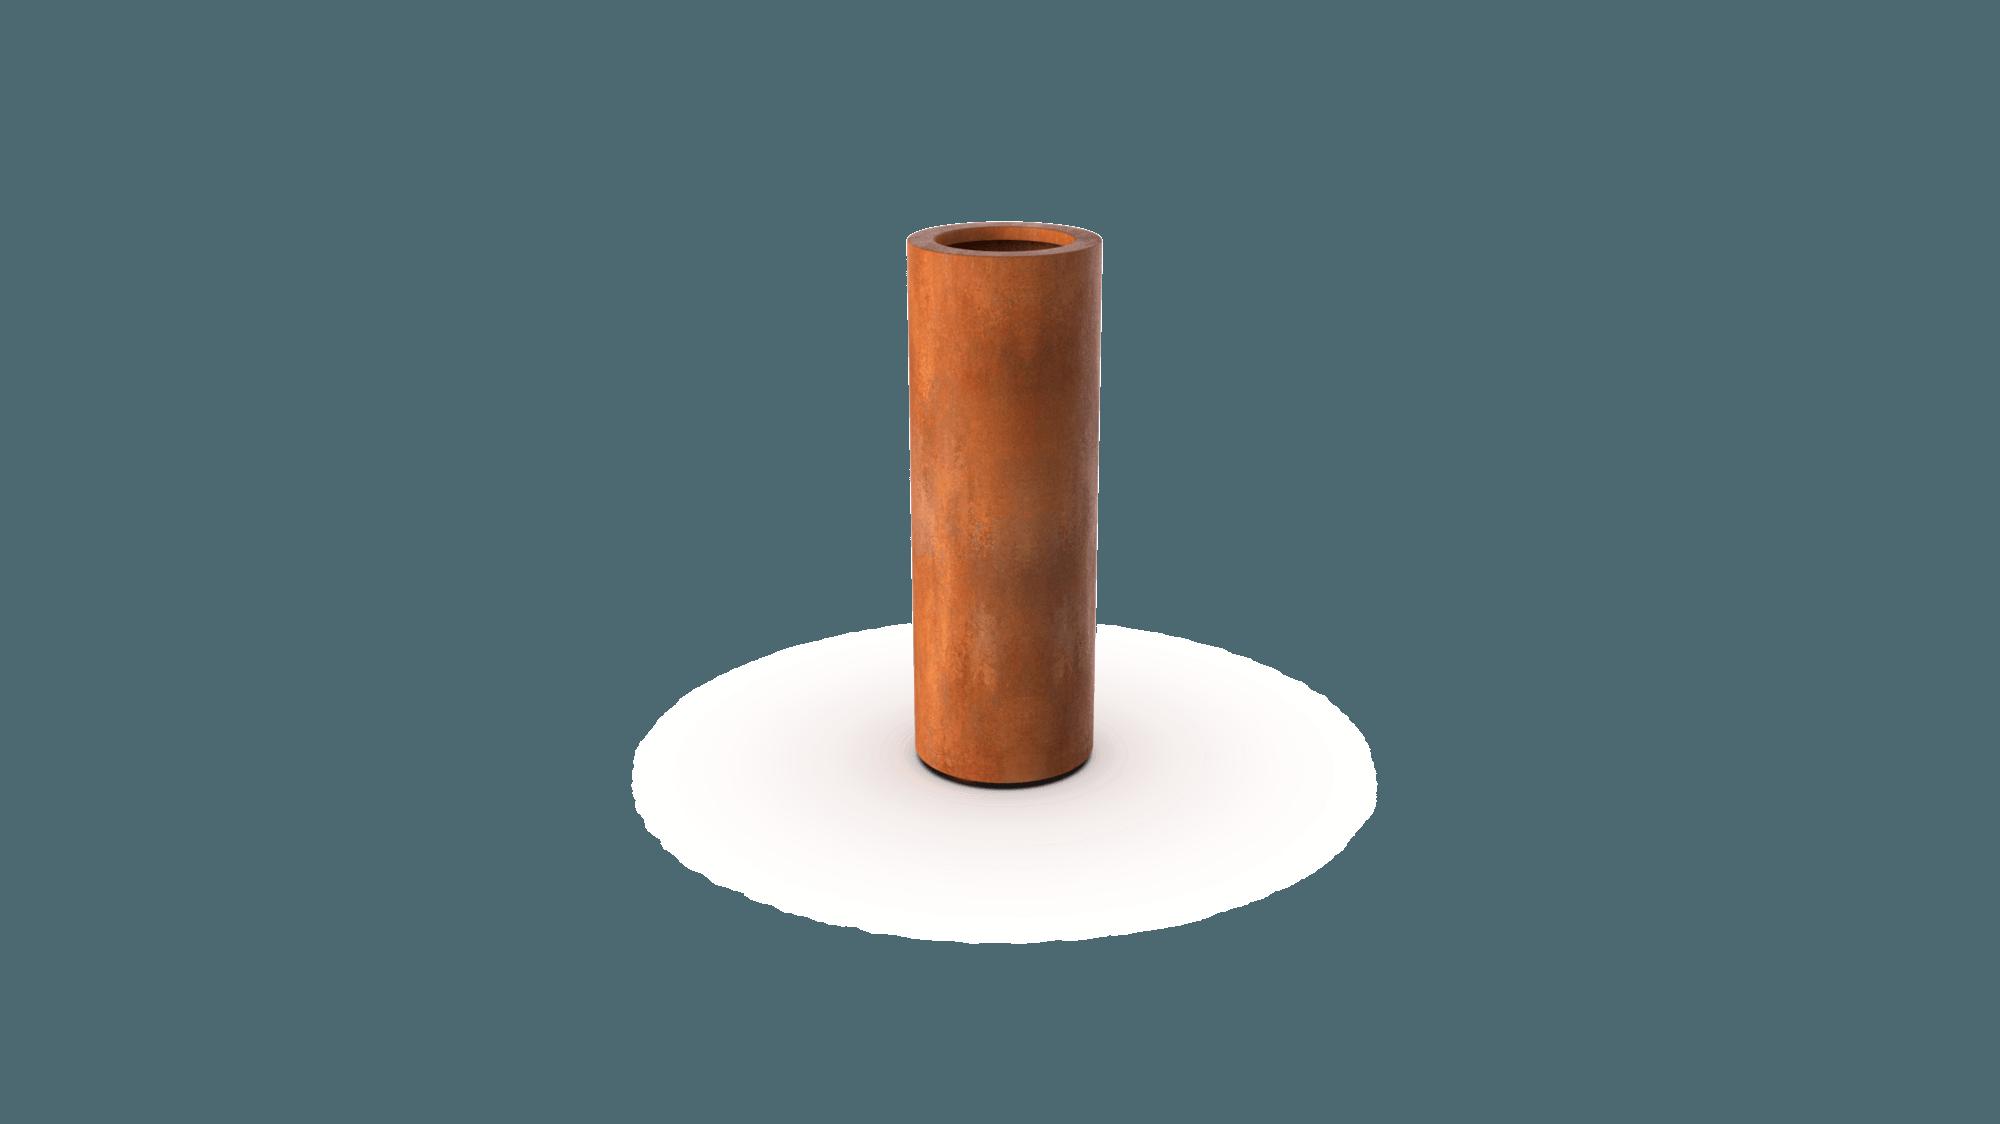 Plantenbak Ronda roestkleurig 100x35 cm Geroba